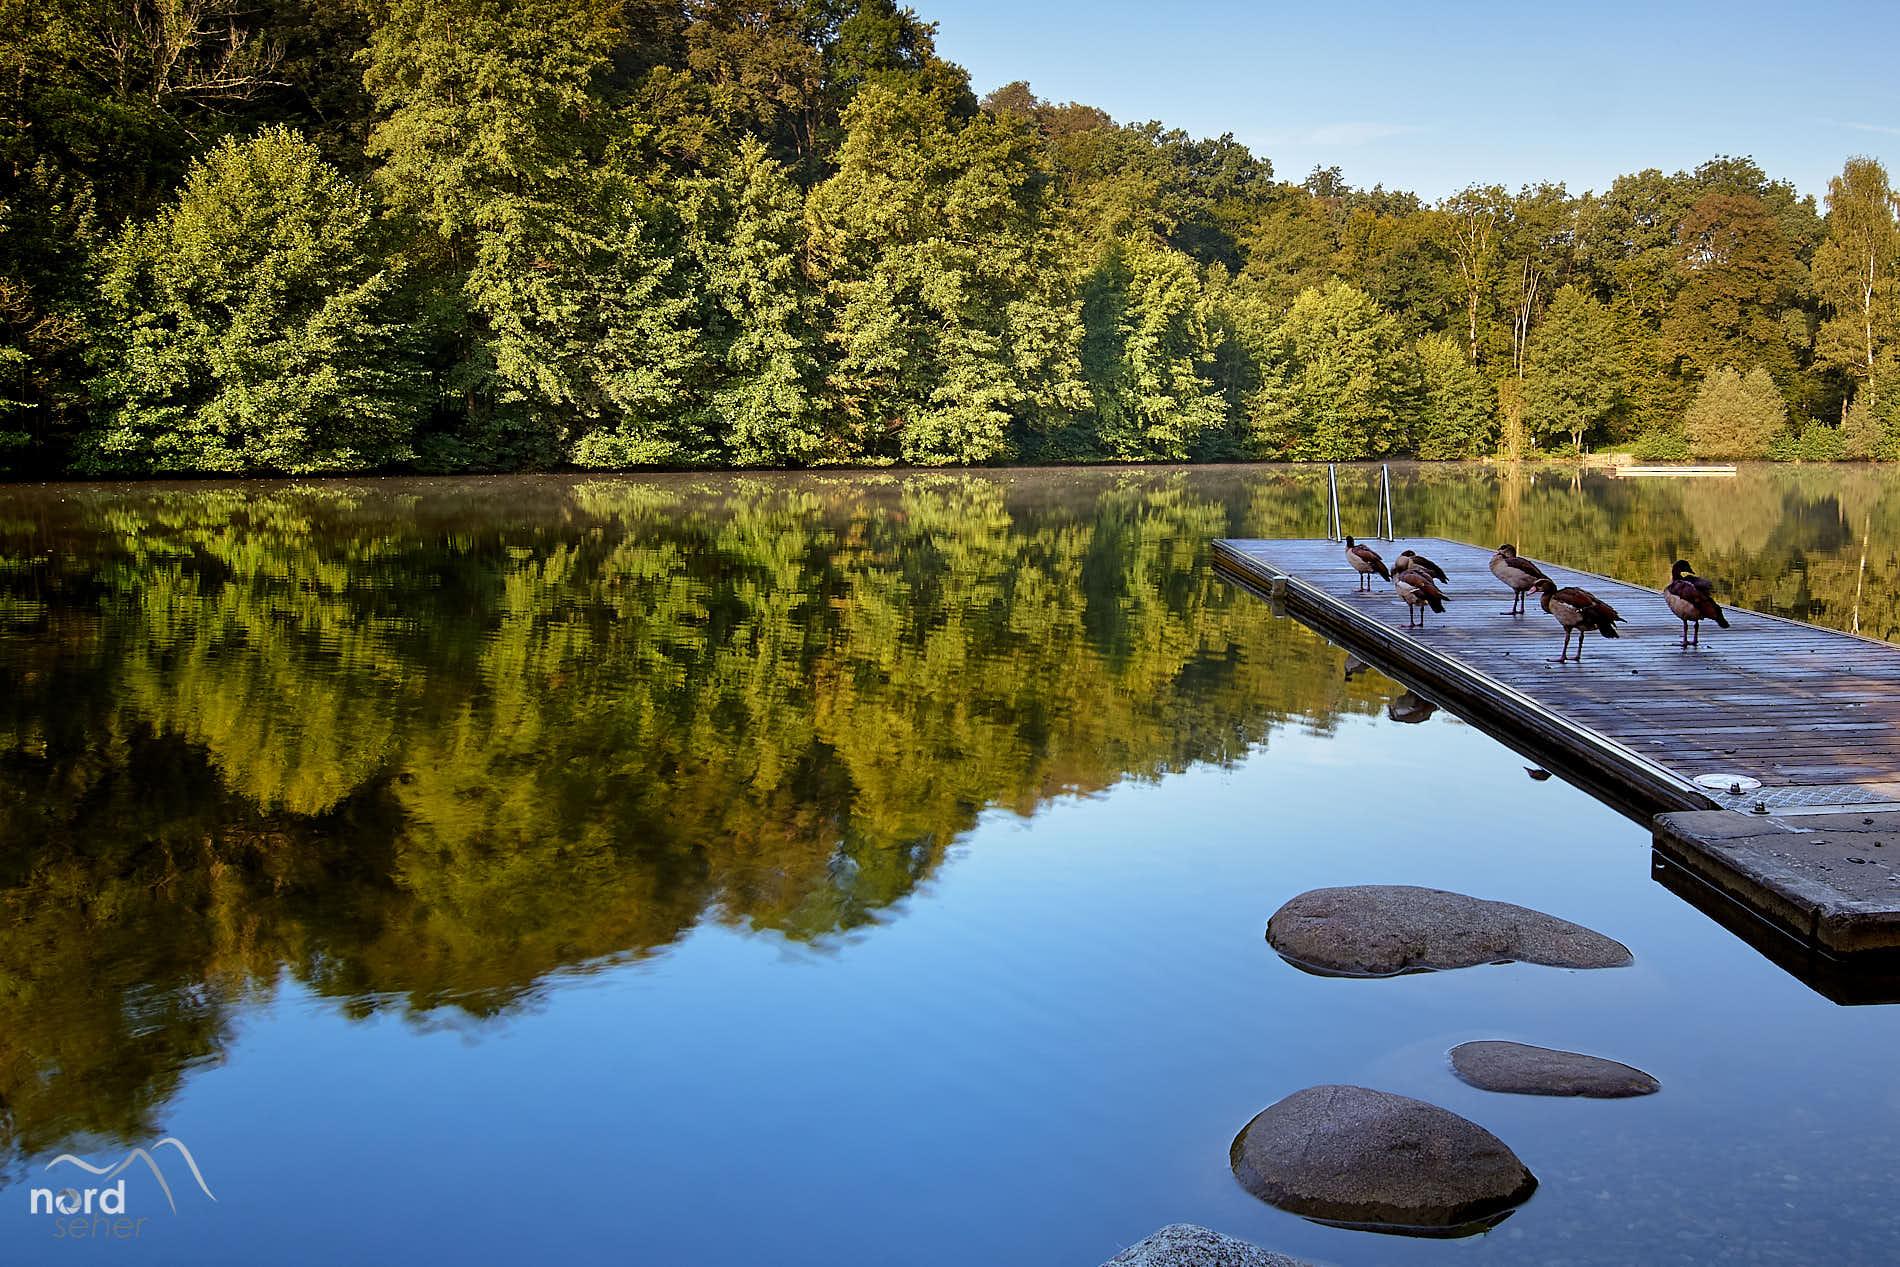 Kirchheimer Seenplatte, Germany